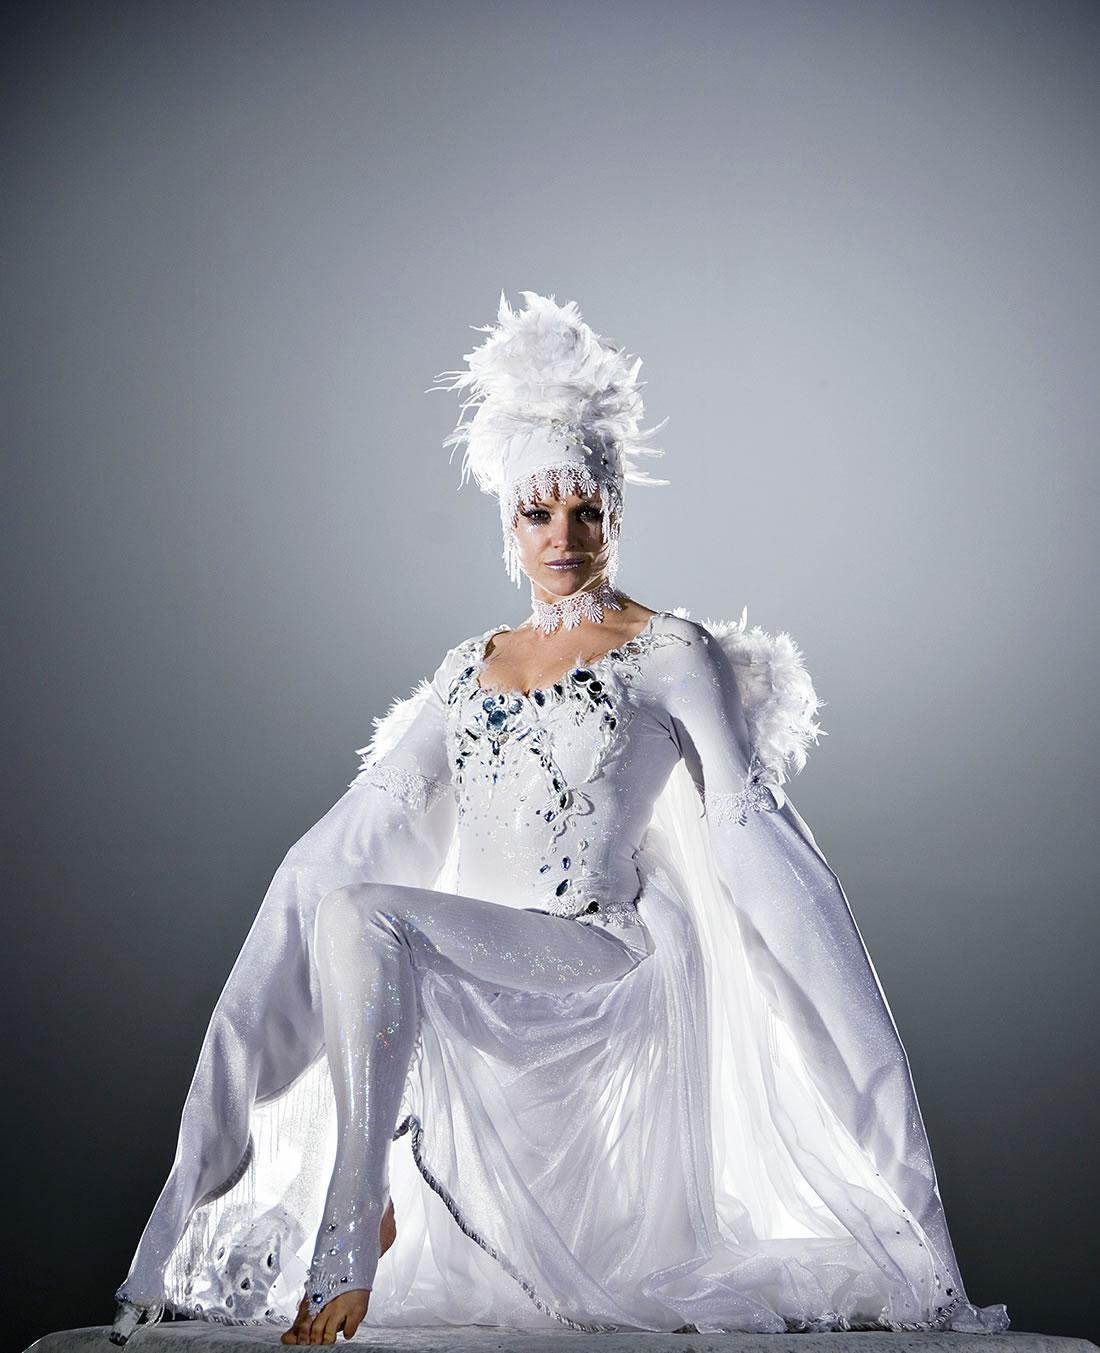 Groundbased Shows - Ballerinas Gallery - Crystalline costume with Swarovski crystals